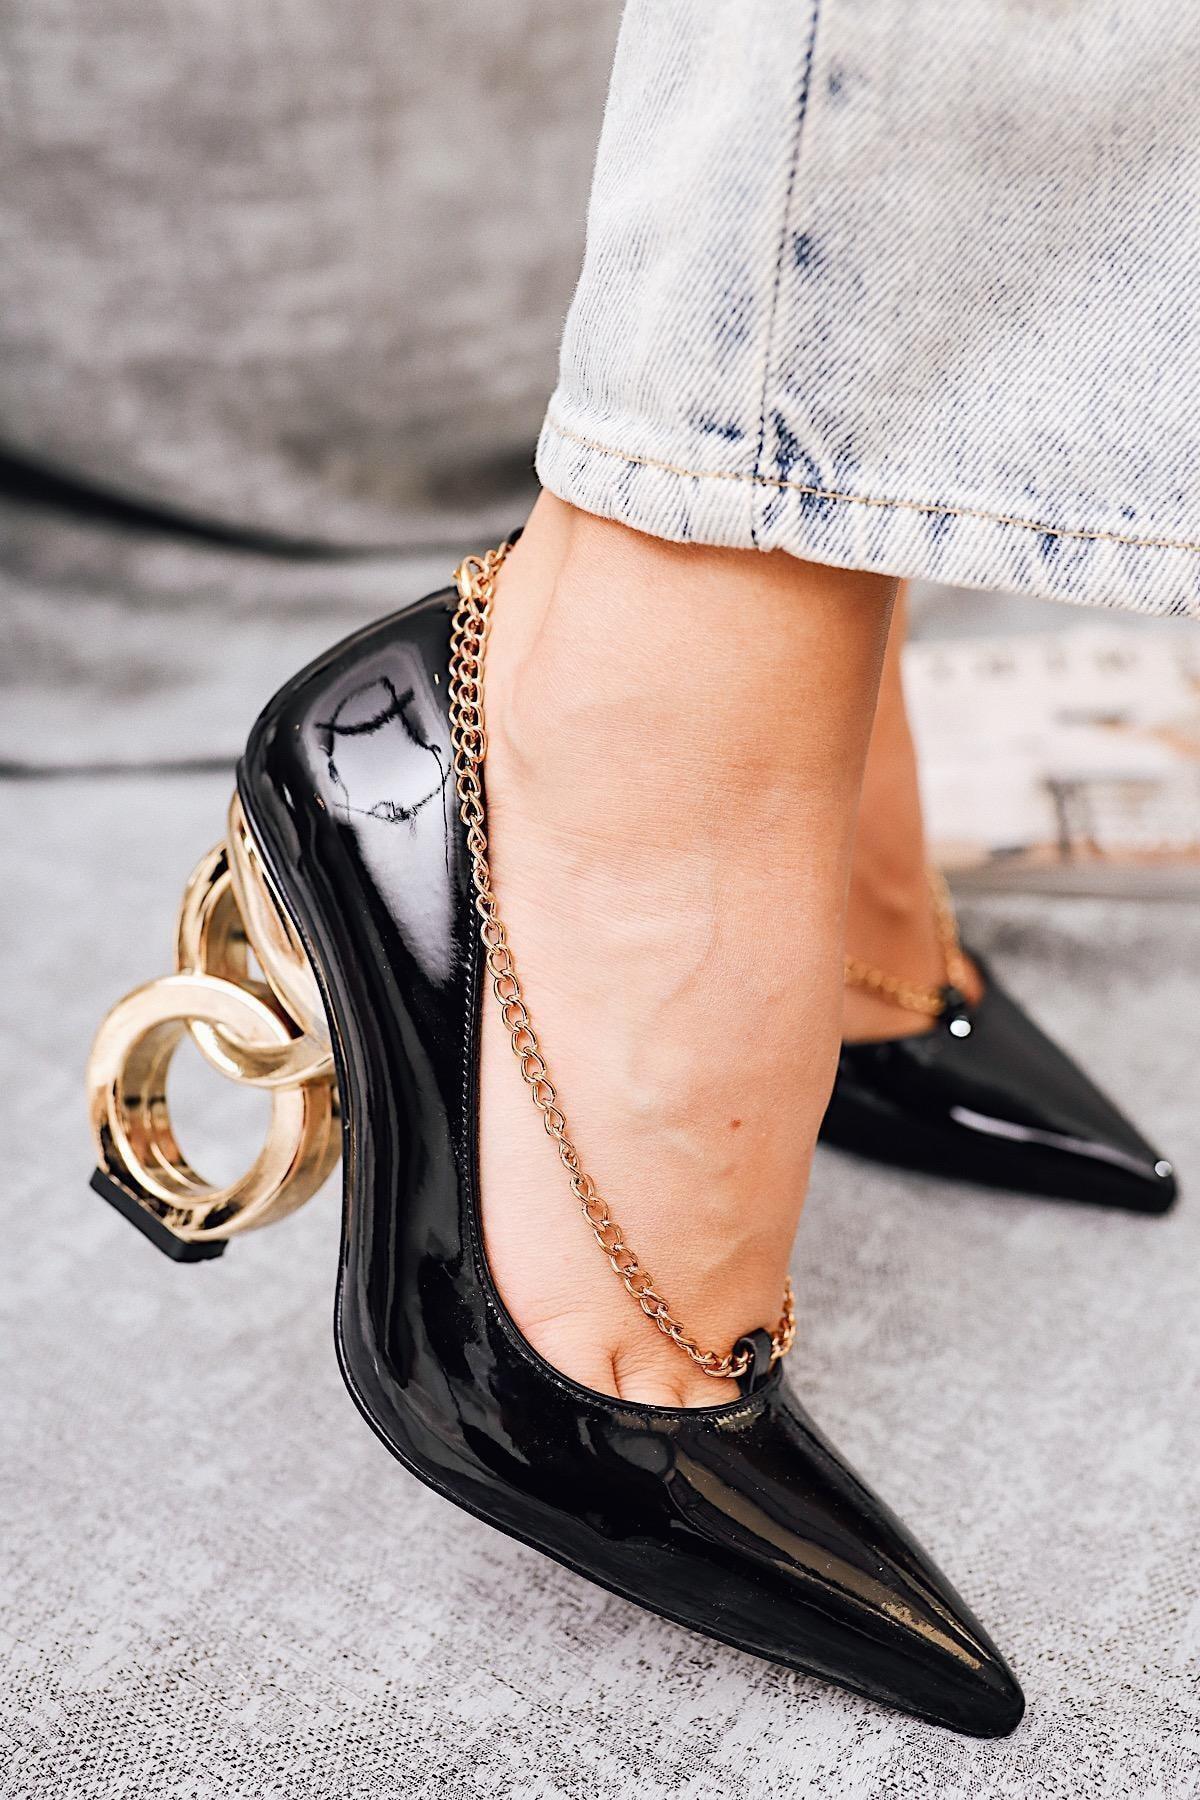 Limoya Elianna Siyah Kırışık Rugan Stiletto ( Zincir Detaylı ) 1